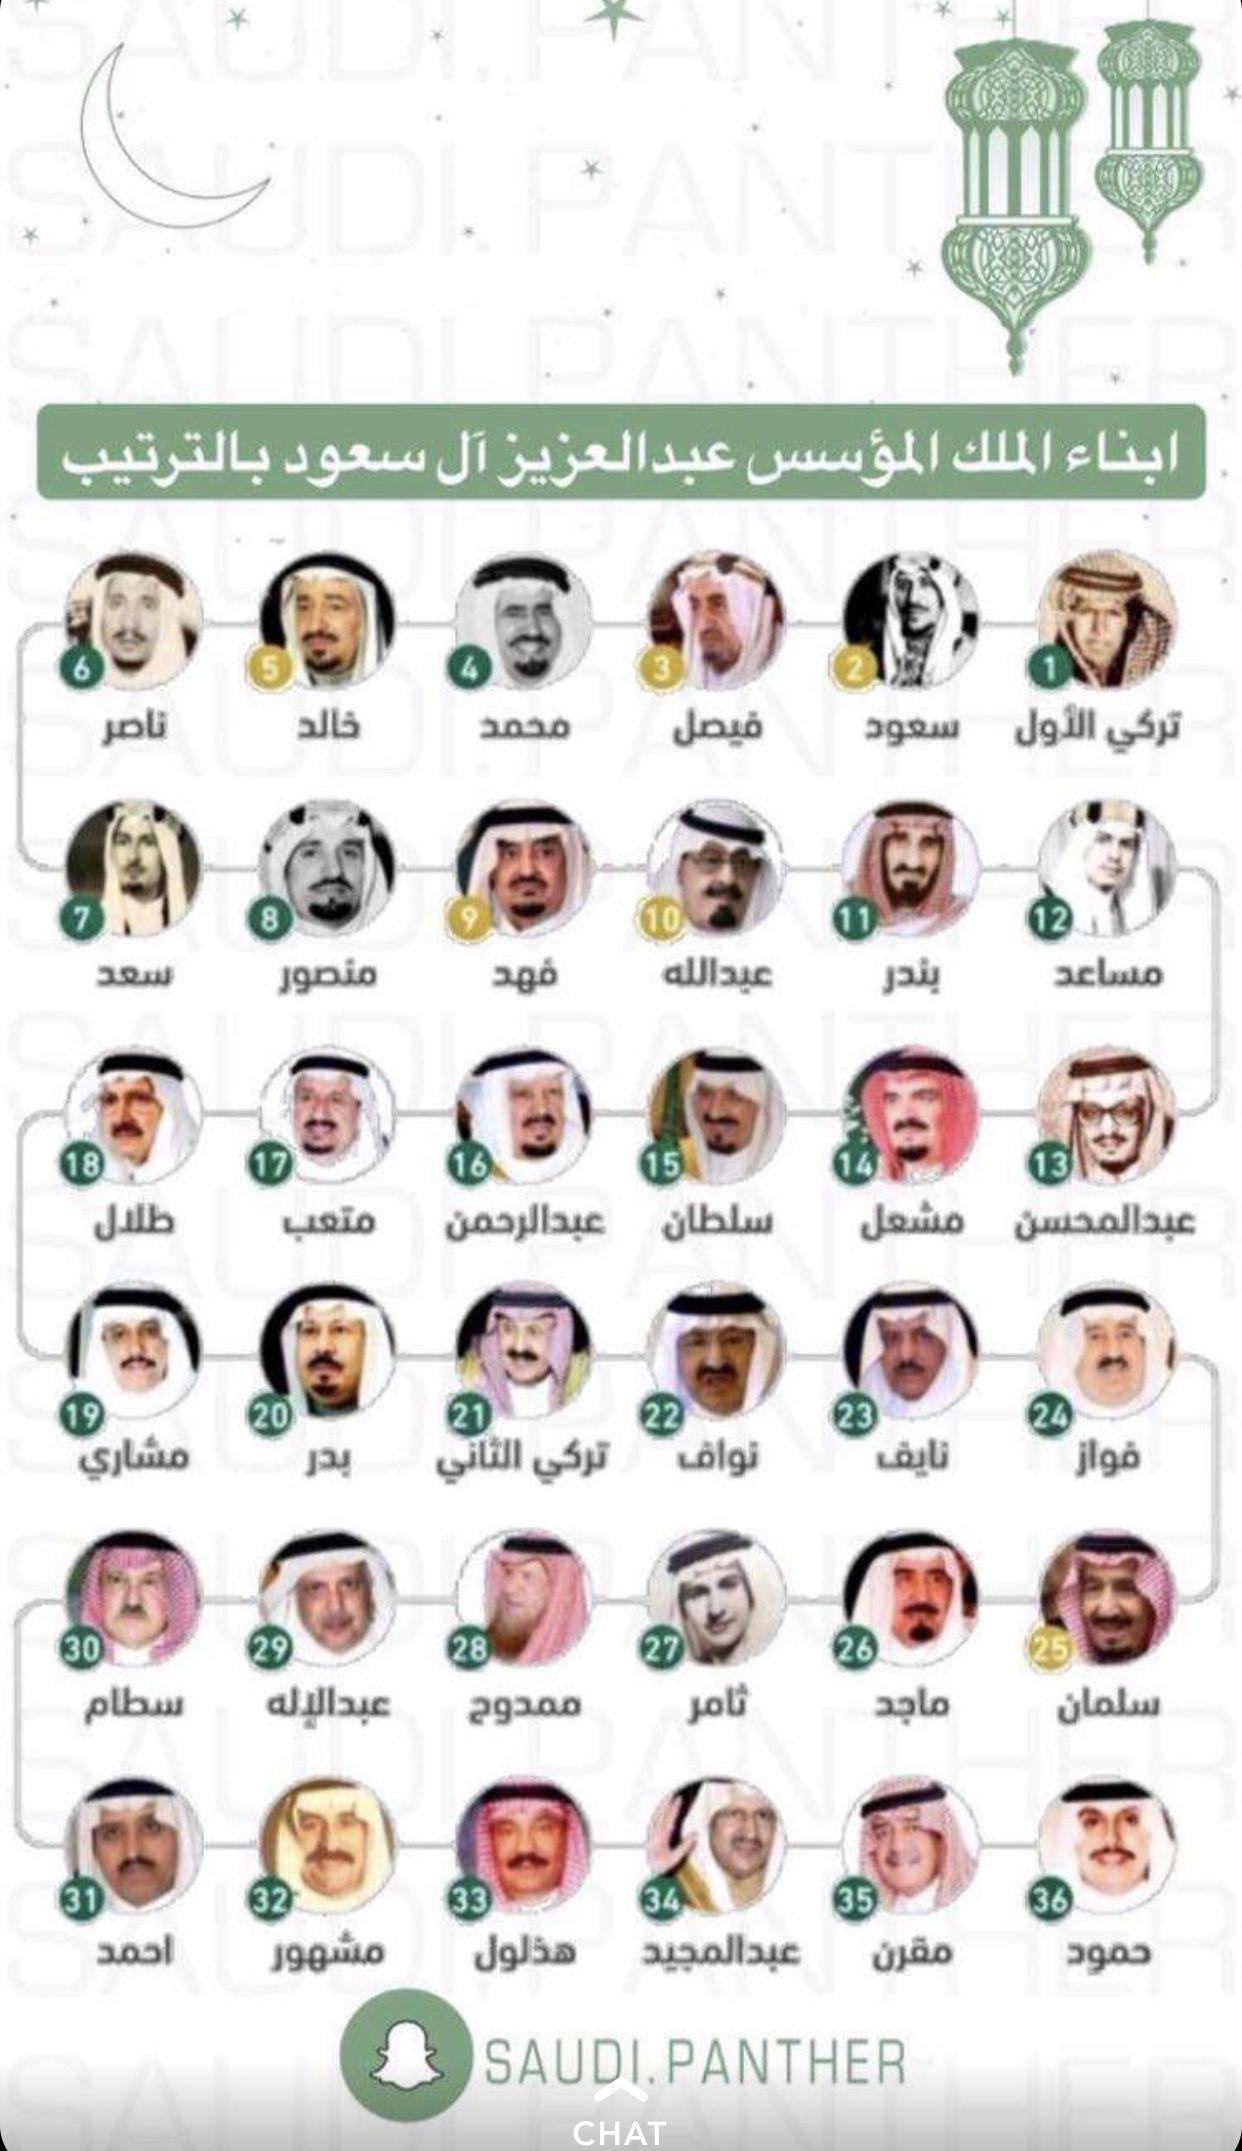 Pin By Re0o0ry ه م س ات ع اب ر ة On Informations معلومات Arabic Quotes Arabic Langauge How To Plan